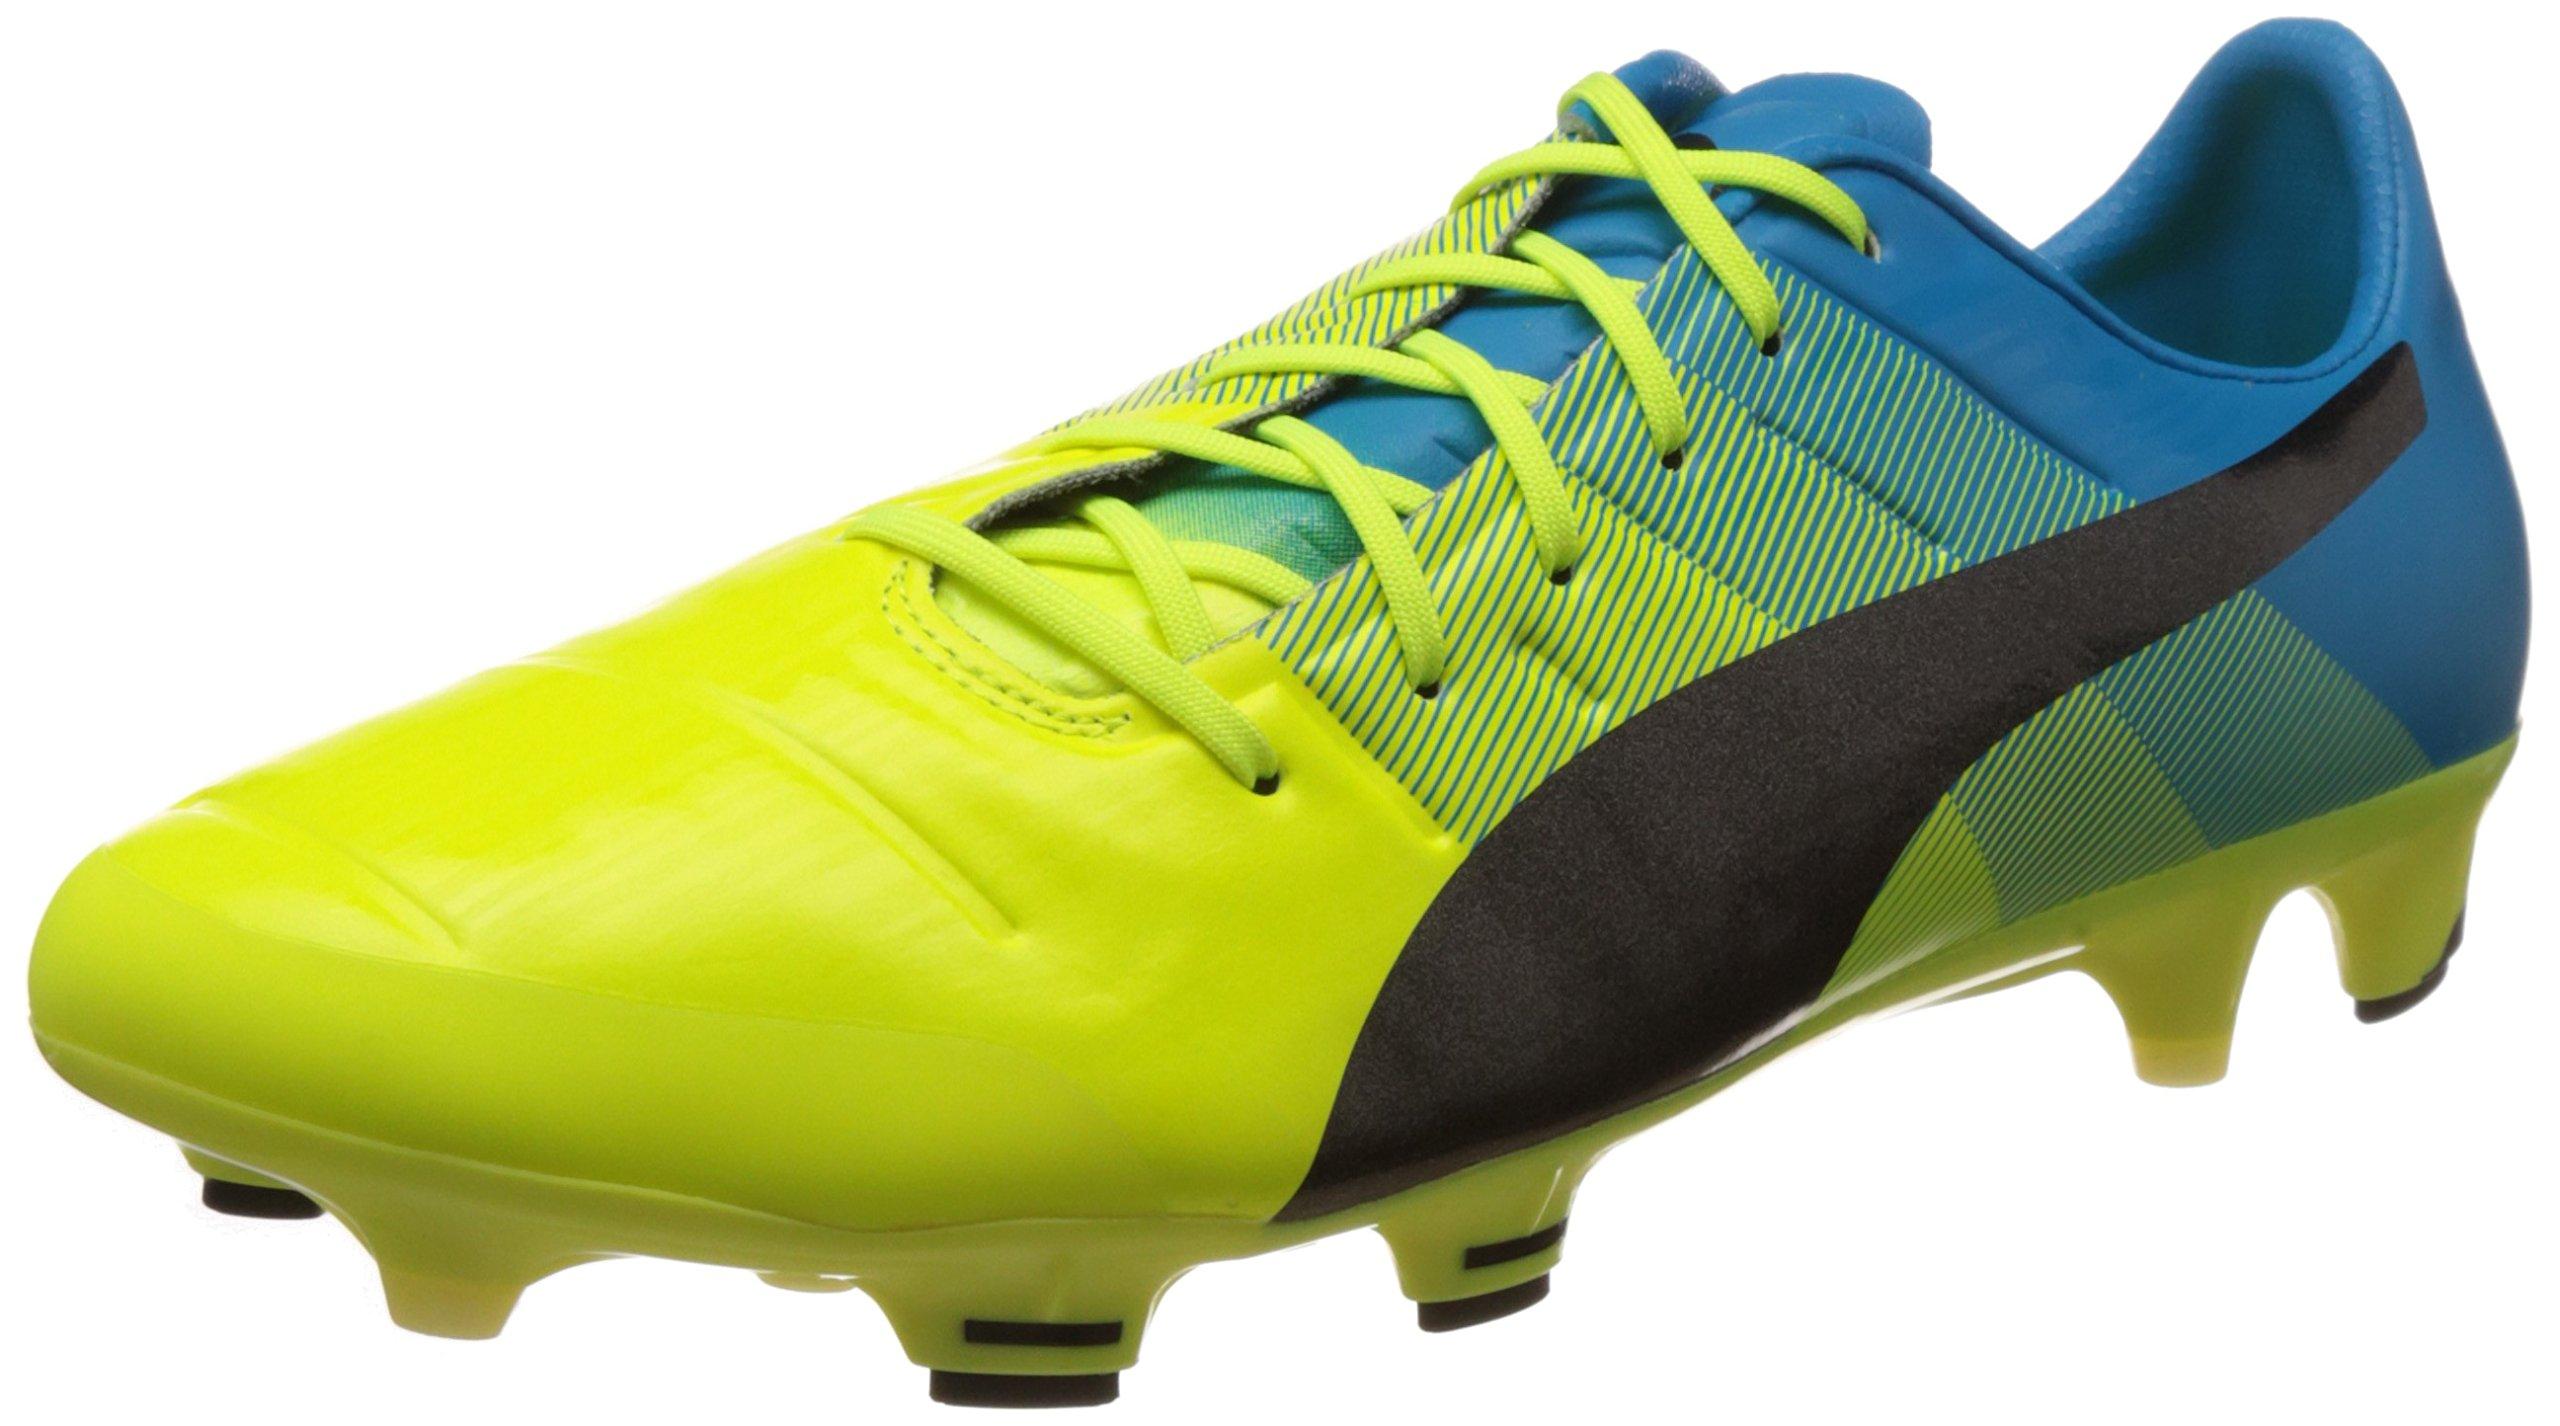 Homme Multicoloresafety black atomic Blue43 Evopower Eu9 De 3 Uk FgChaussures Yellow Puma 1 Football 354ARjL